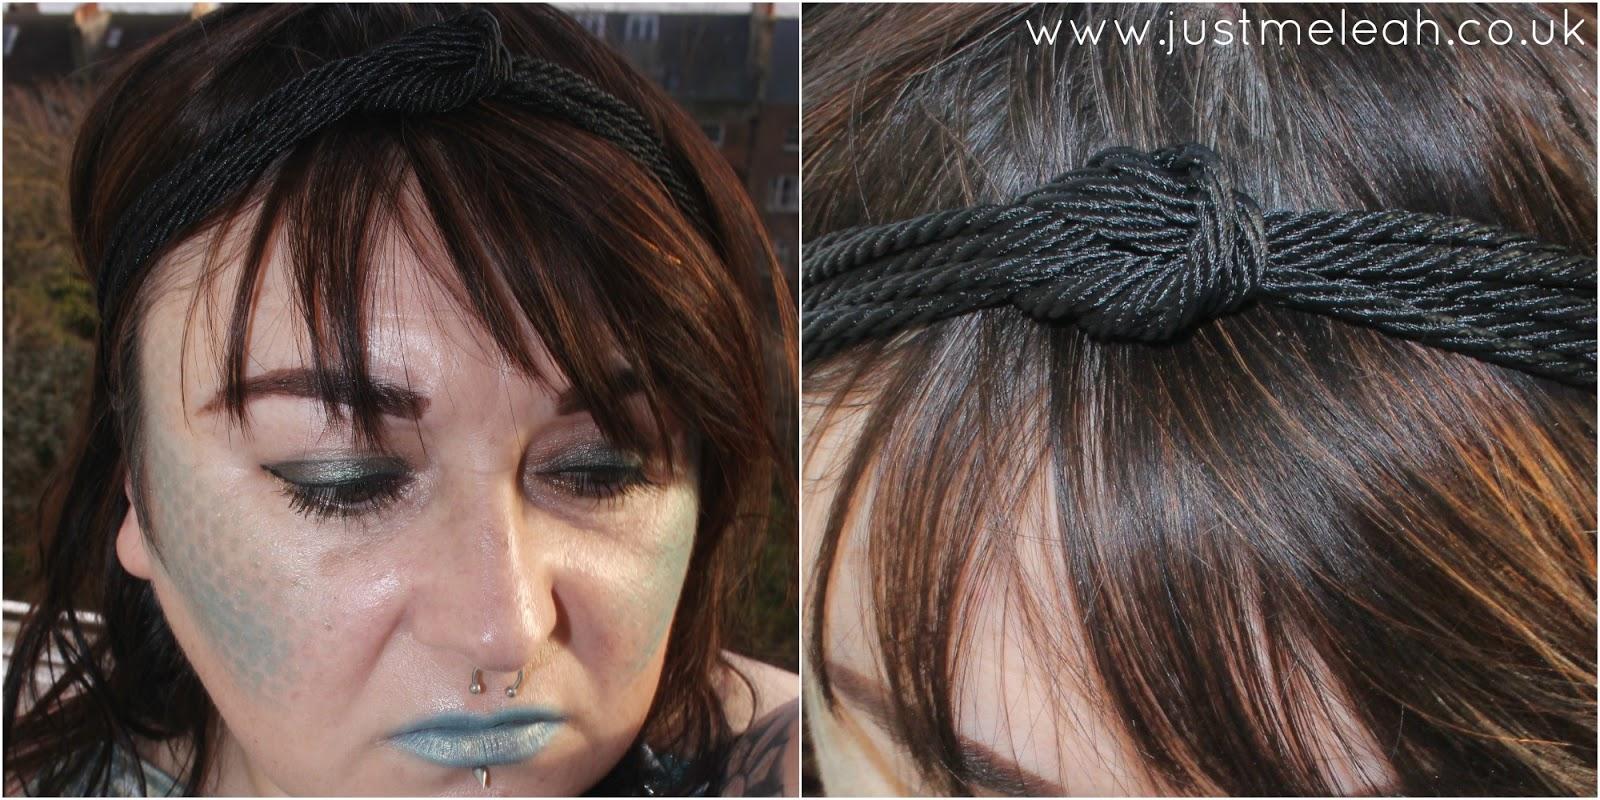 Crown & Glory twist rope headband